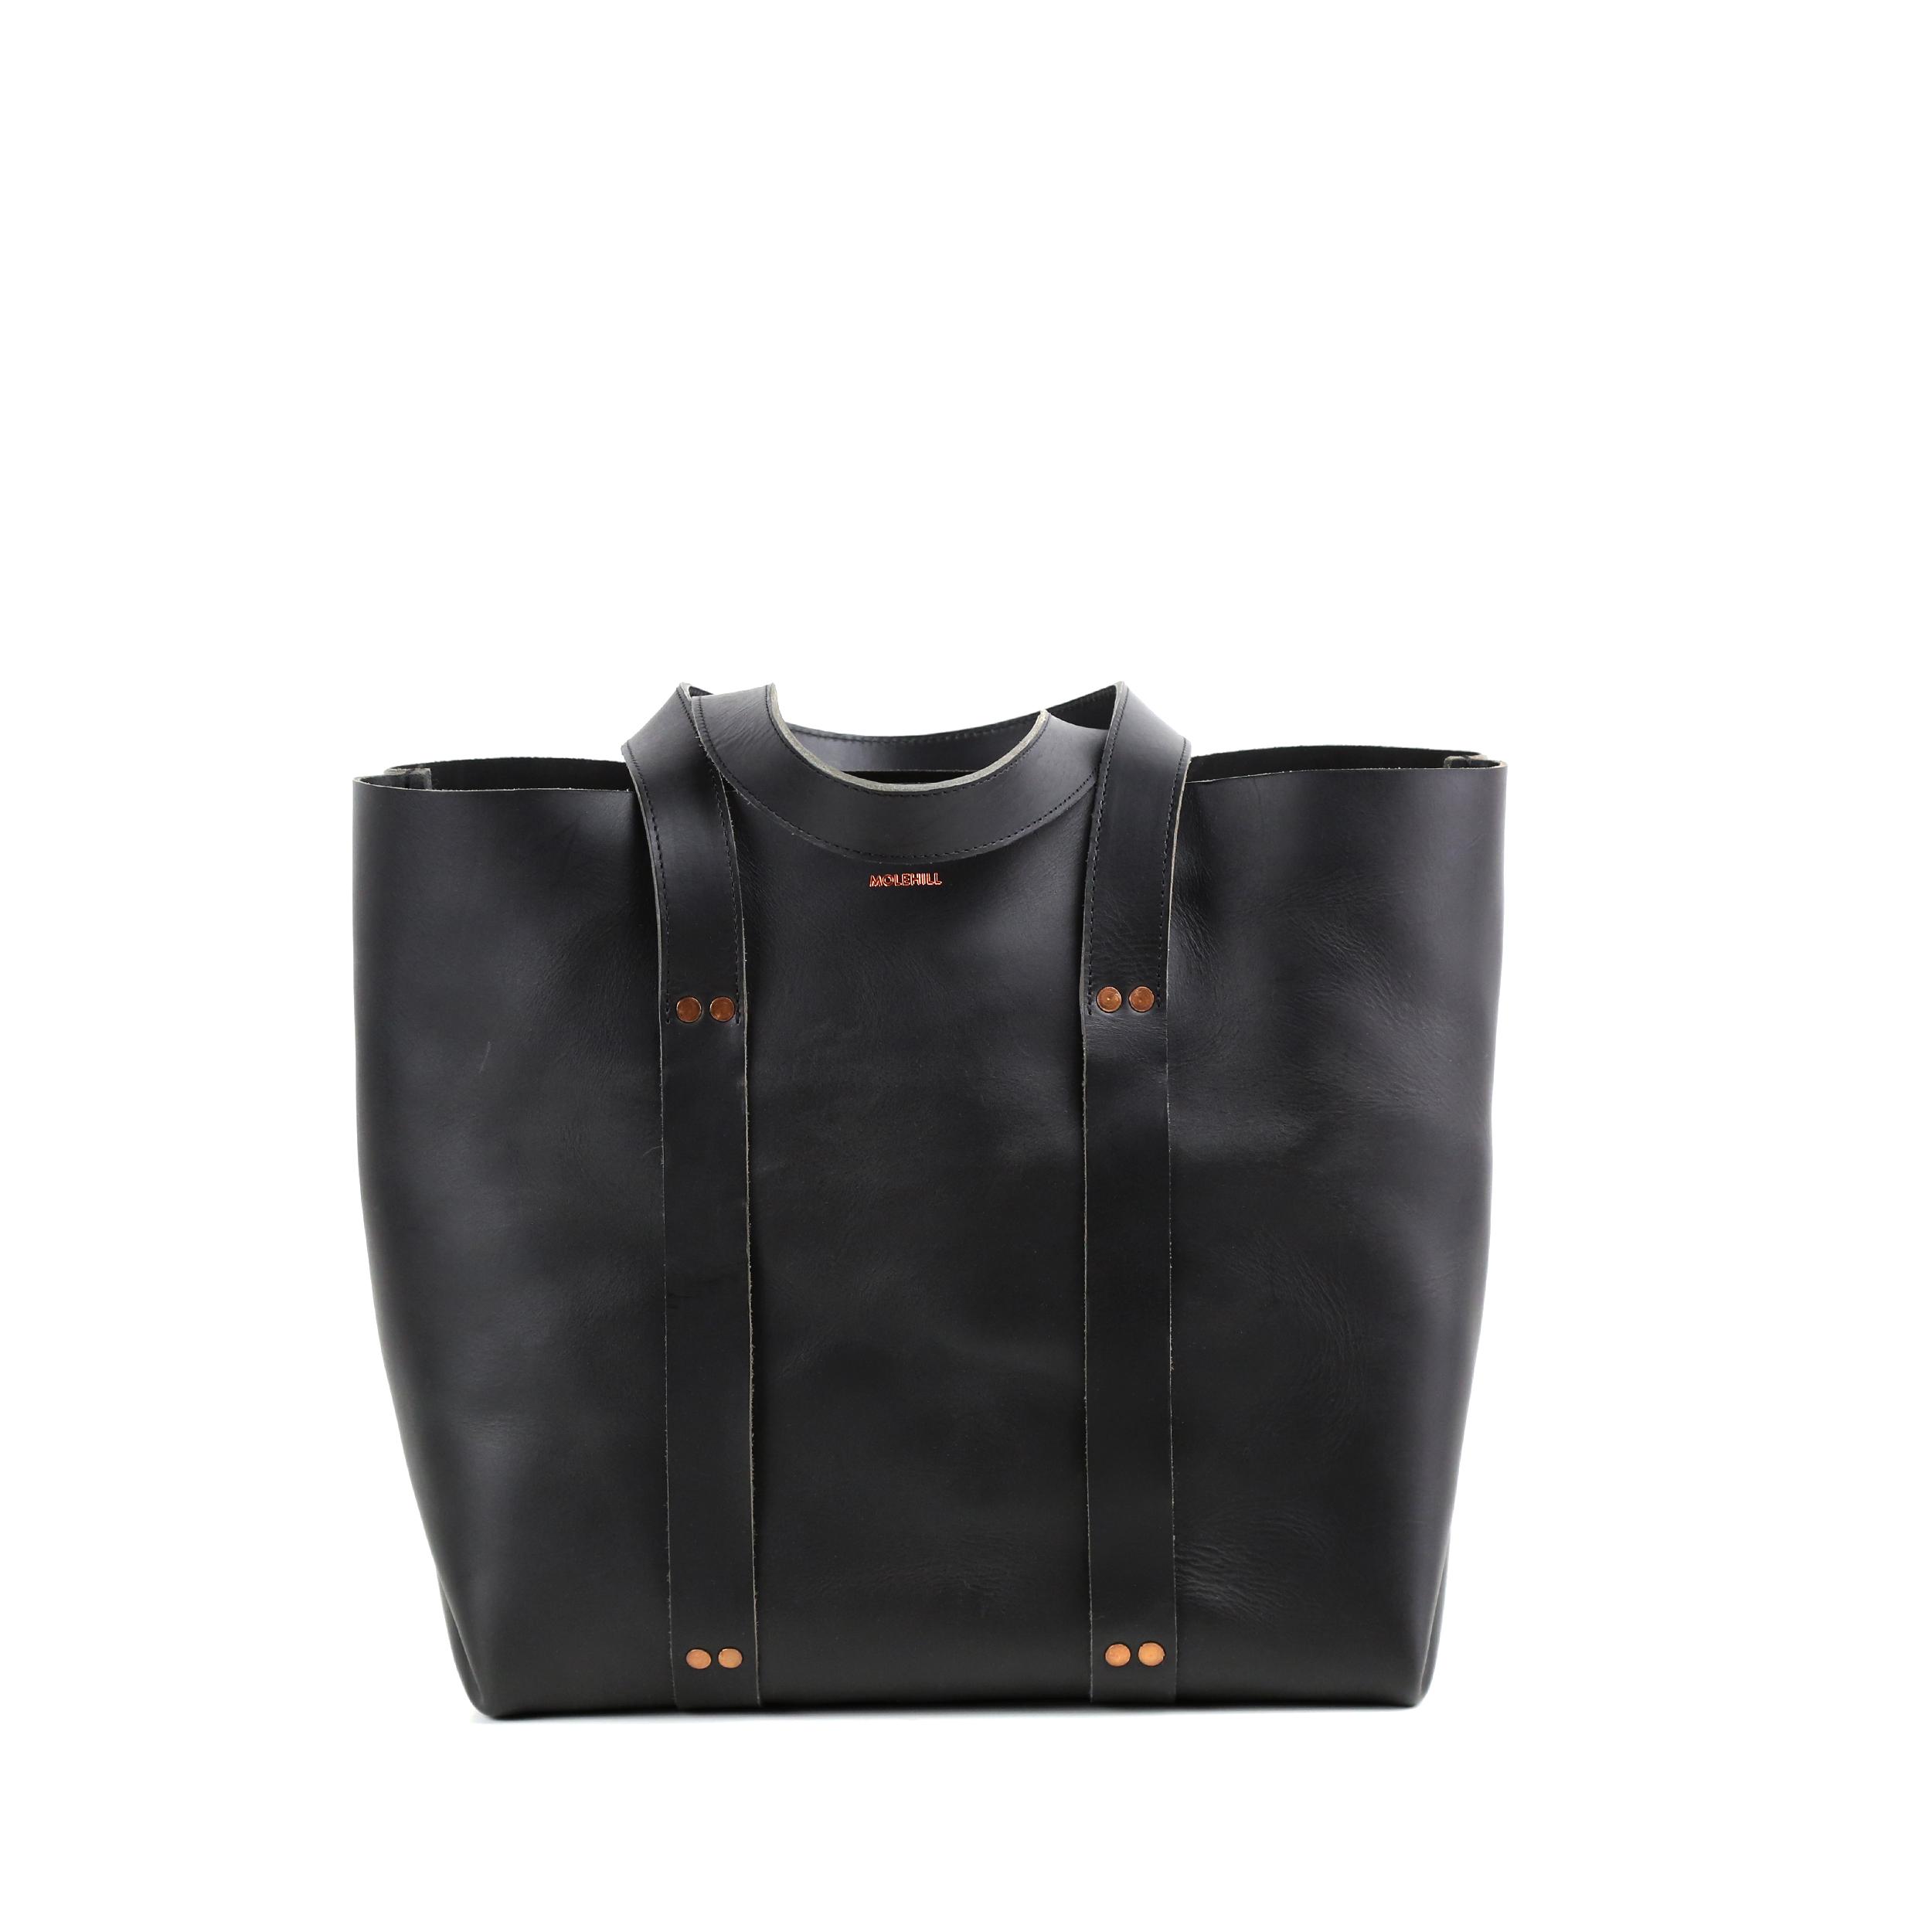 KRAFLA Shopper Black Sample Sale No. 1-1